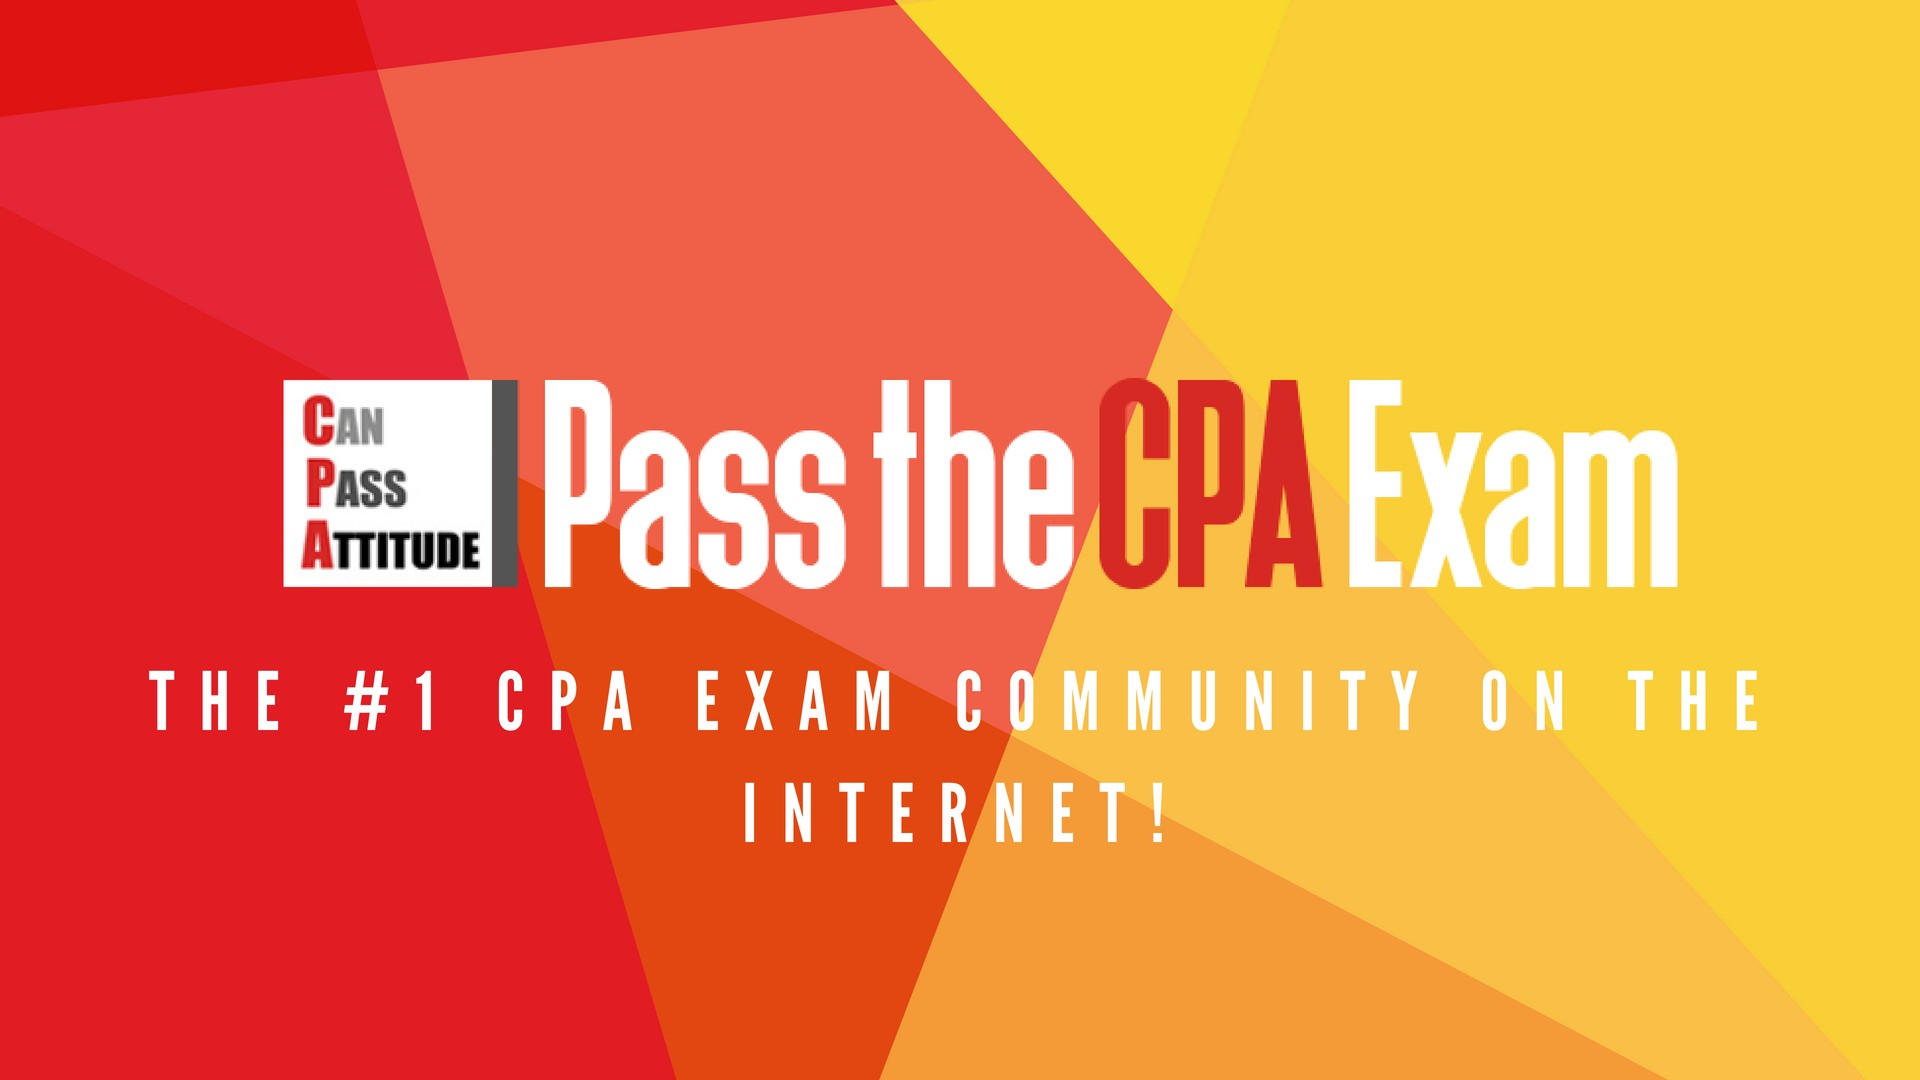 I Pass The CPA Exam | LinkedIn